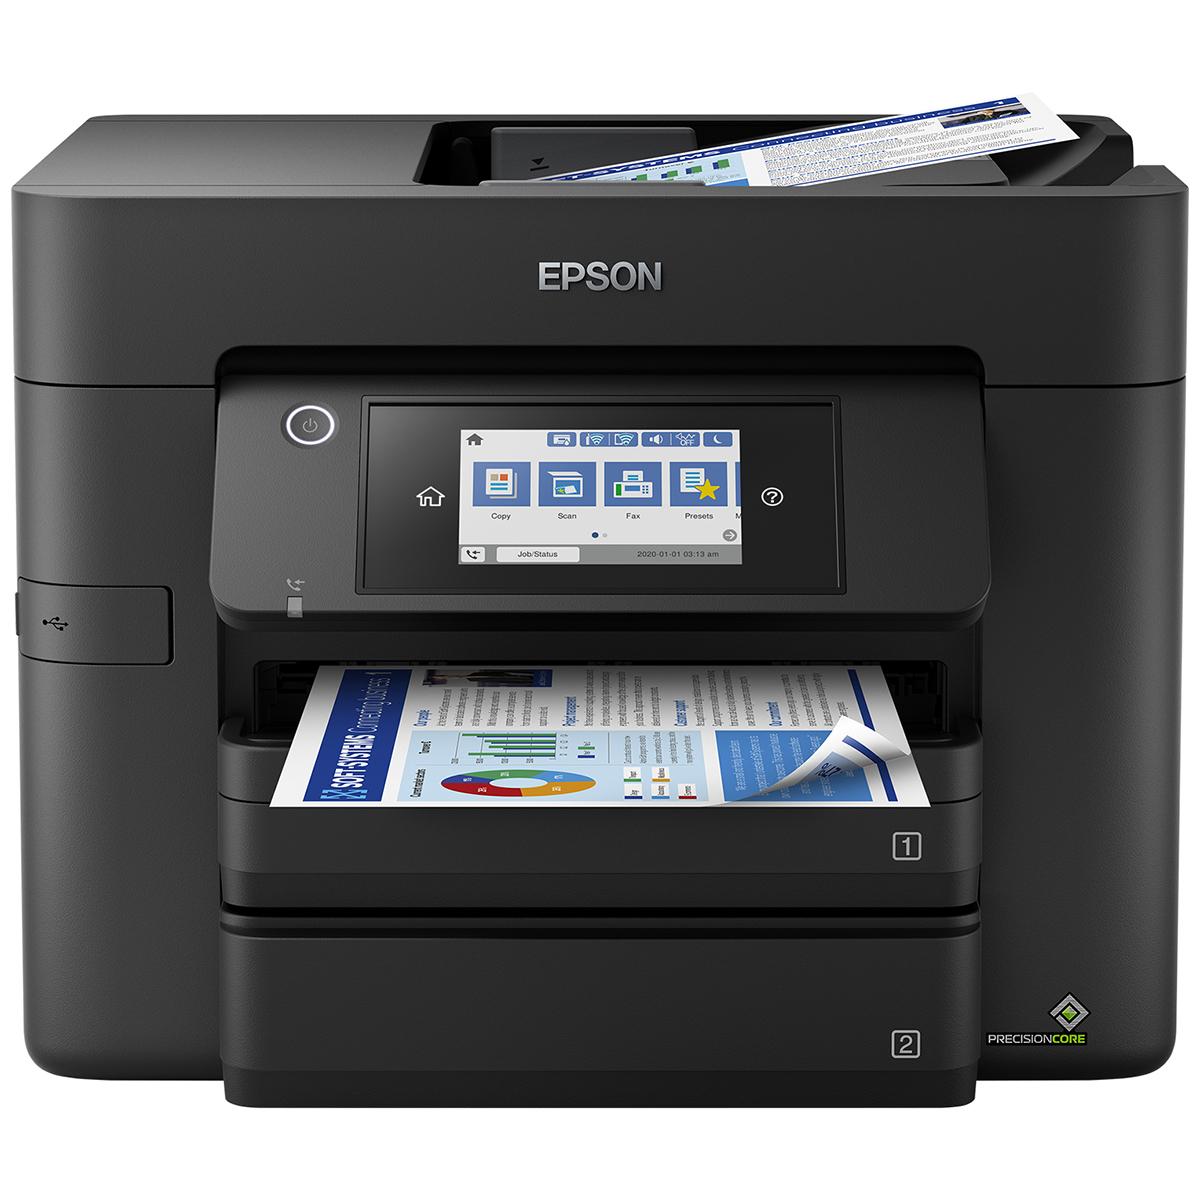 Epson WorkForce PRO WF-4830DTWF A4 Colour Inkjet Multifunction